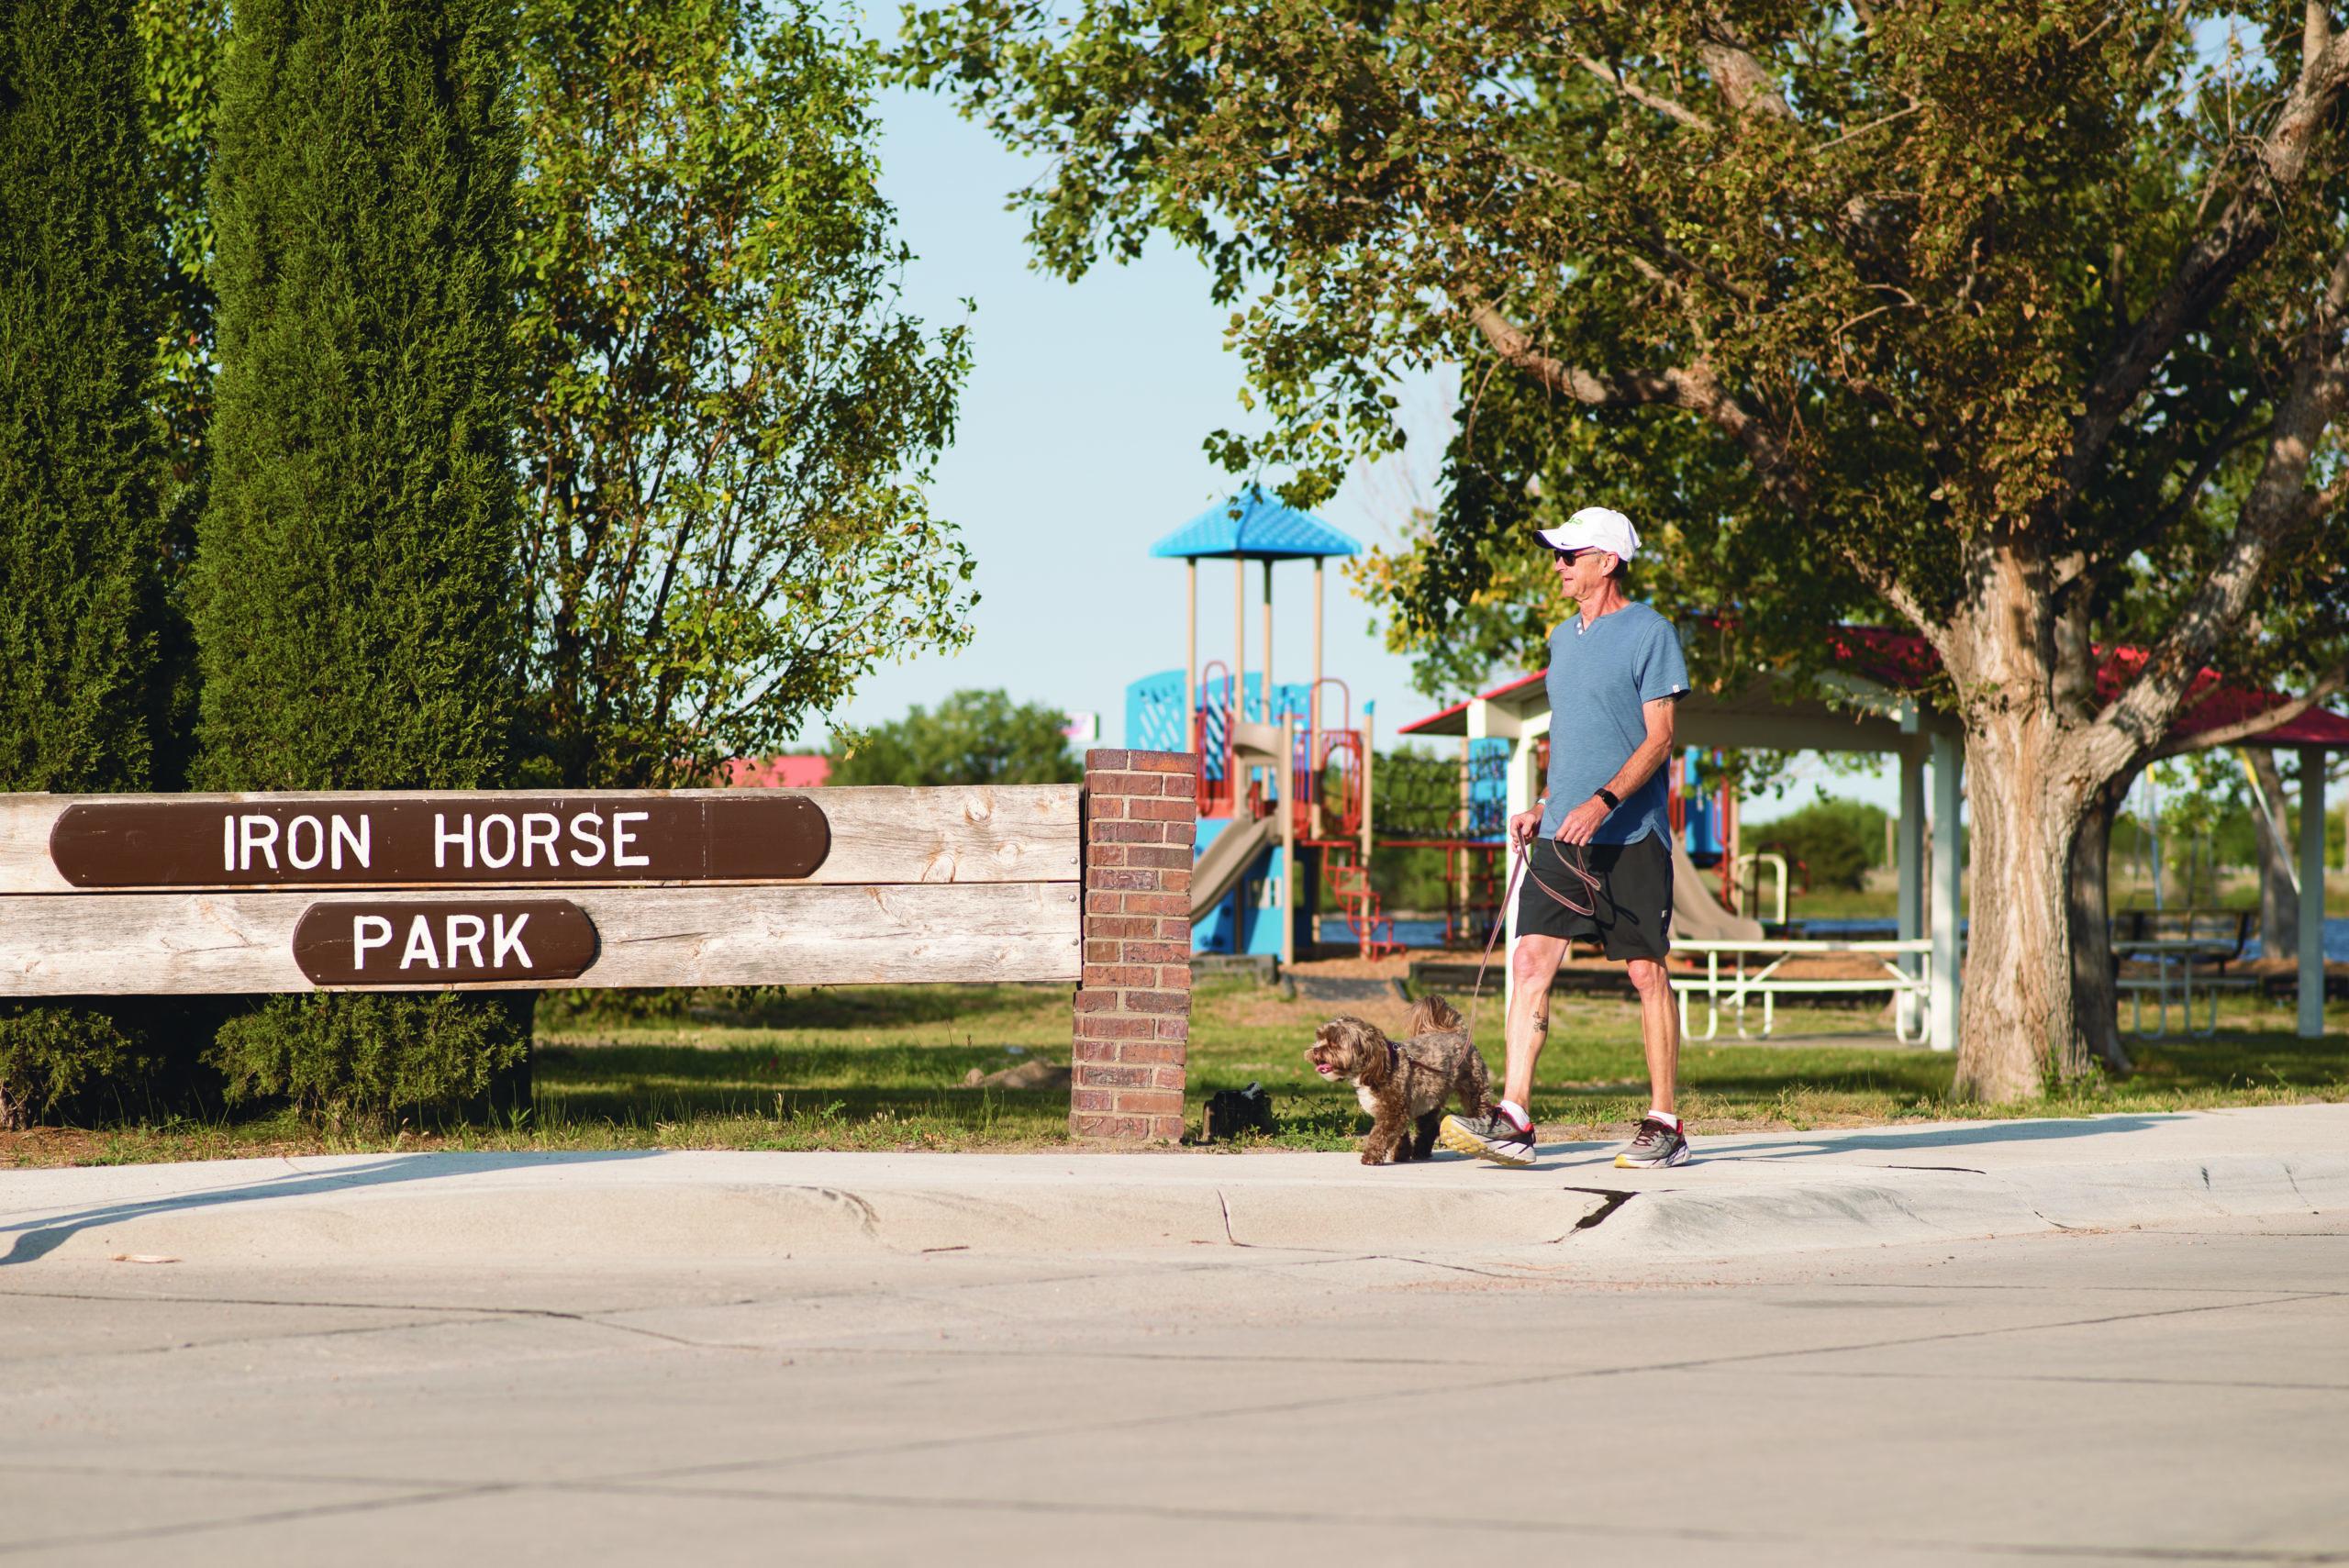 north platte trails network, iron horse lake, trails, hiking, biking, running, north platte, nebraska, ne, north platte area sports commission, outdoor sports, play north platte